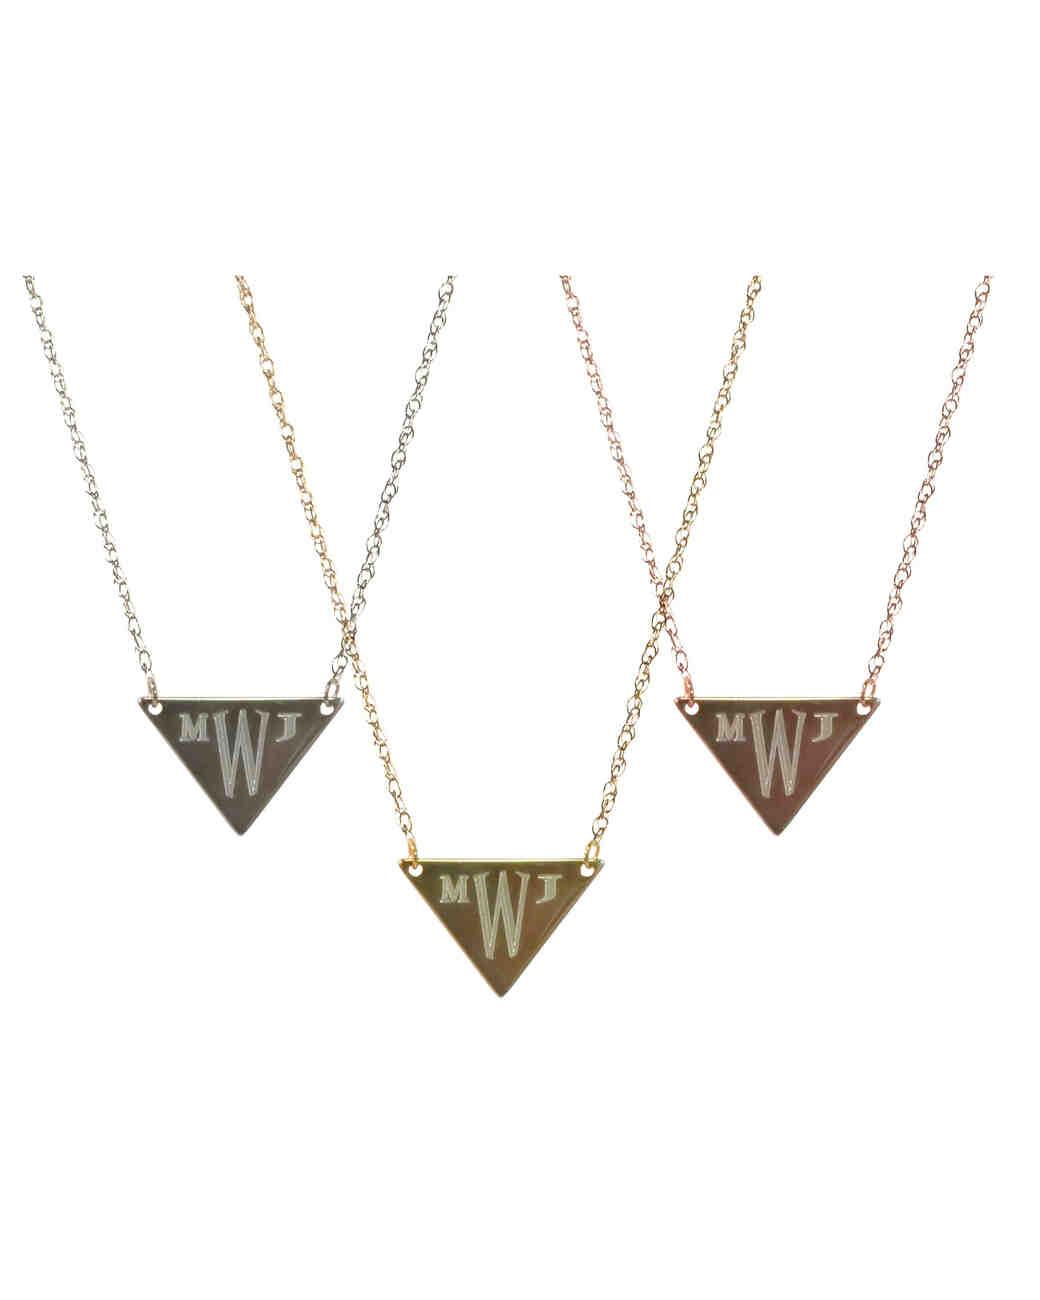 personalized-jewelry-golden-thread-1215.jpg